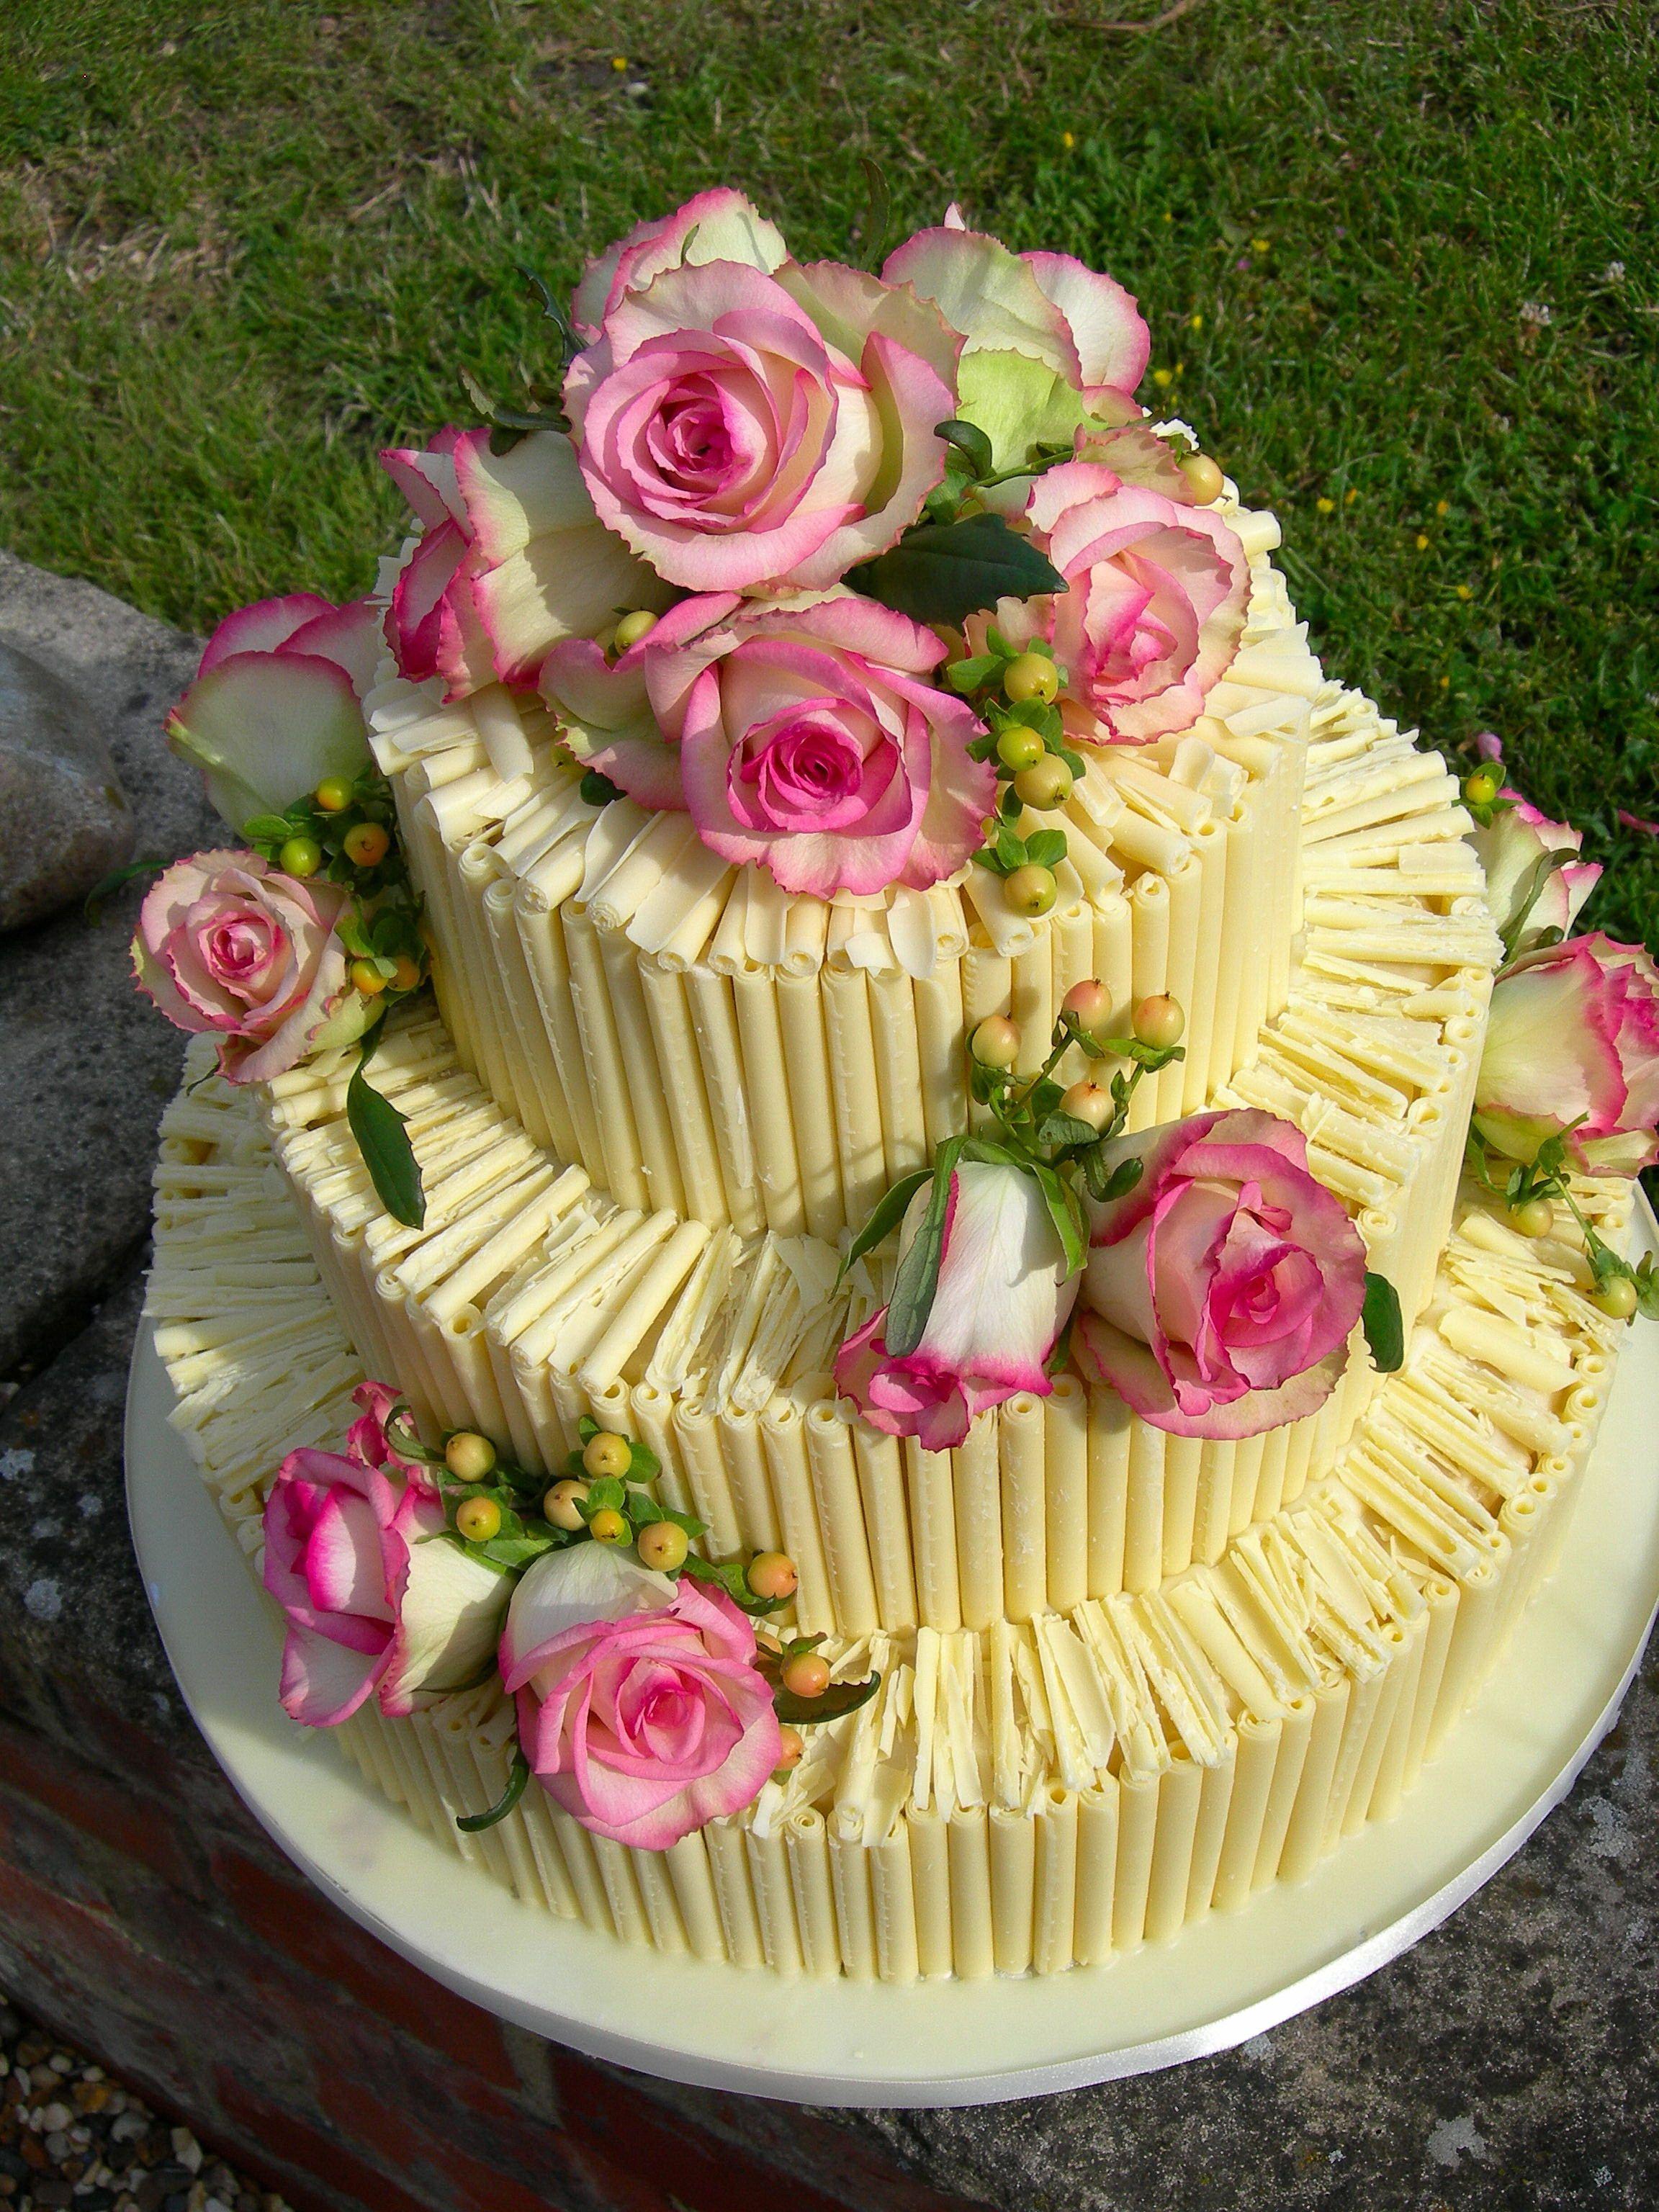 Chocolate wedding cake layered with a Belgian chocolate ganache ...